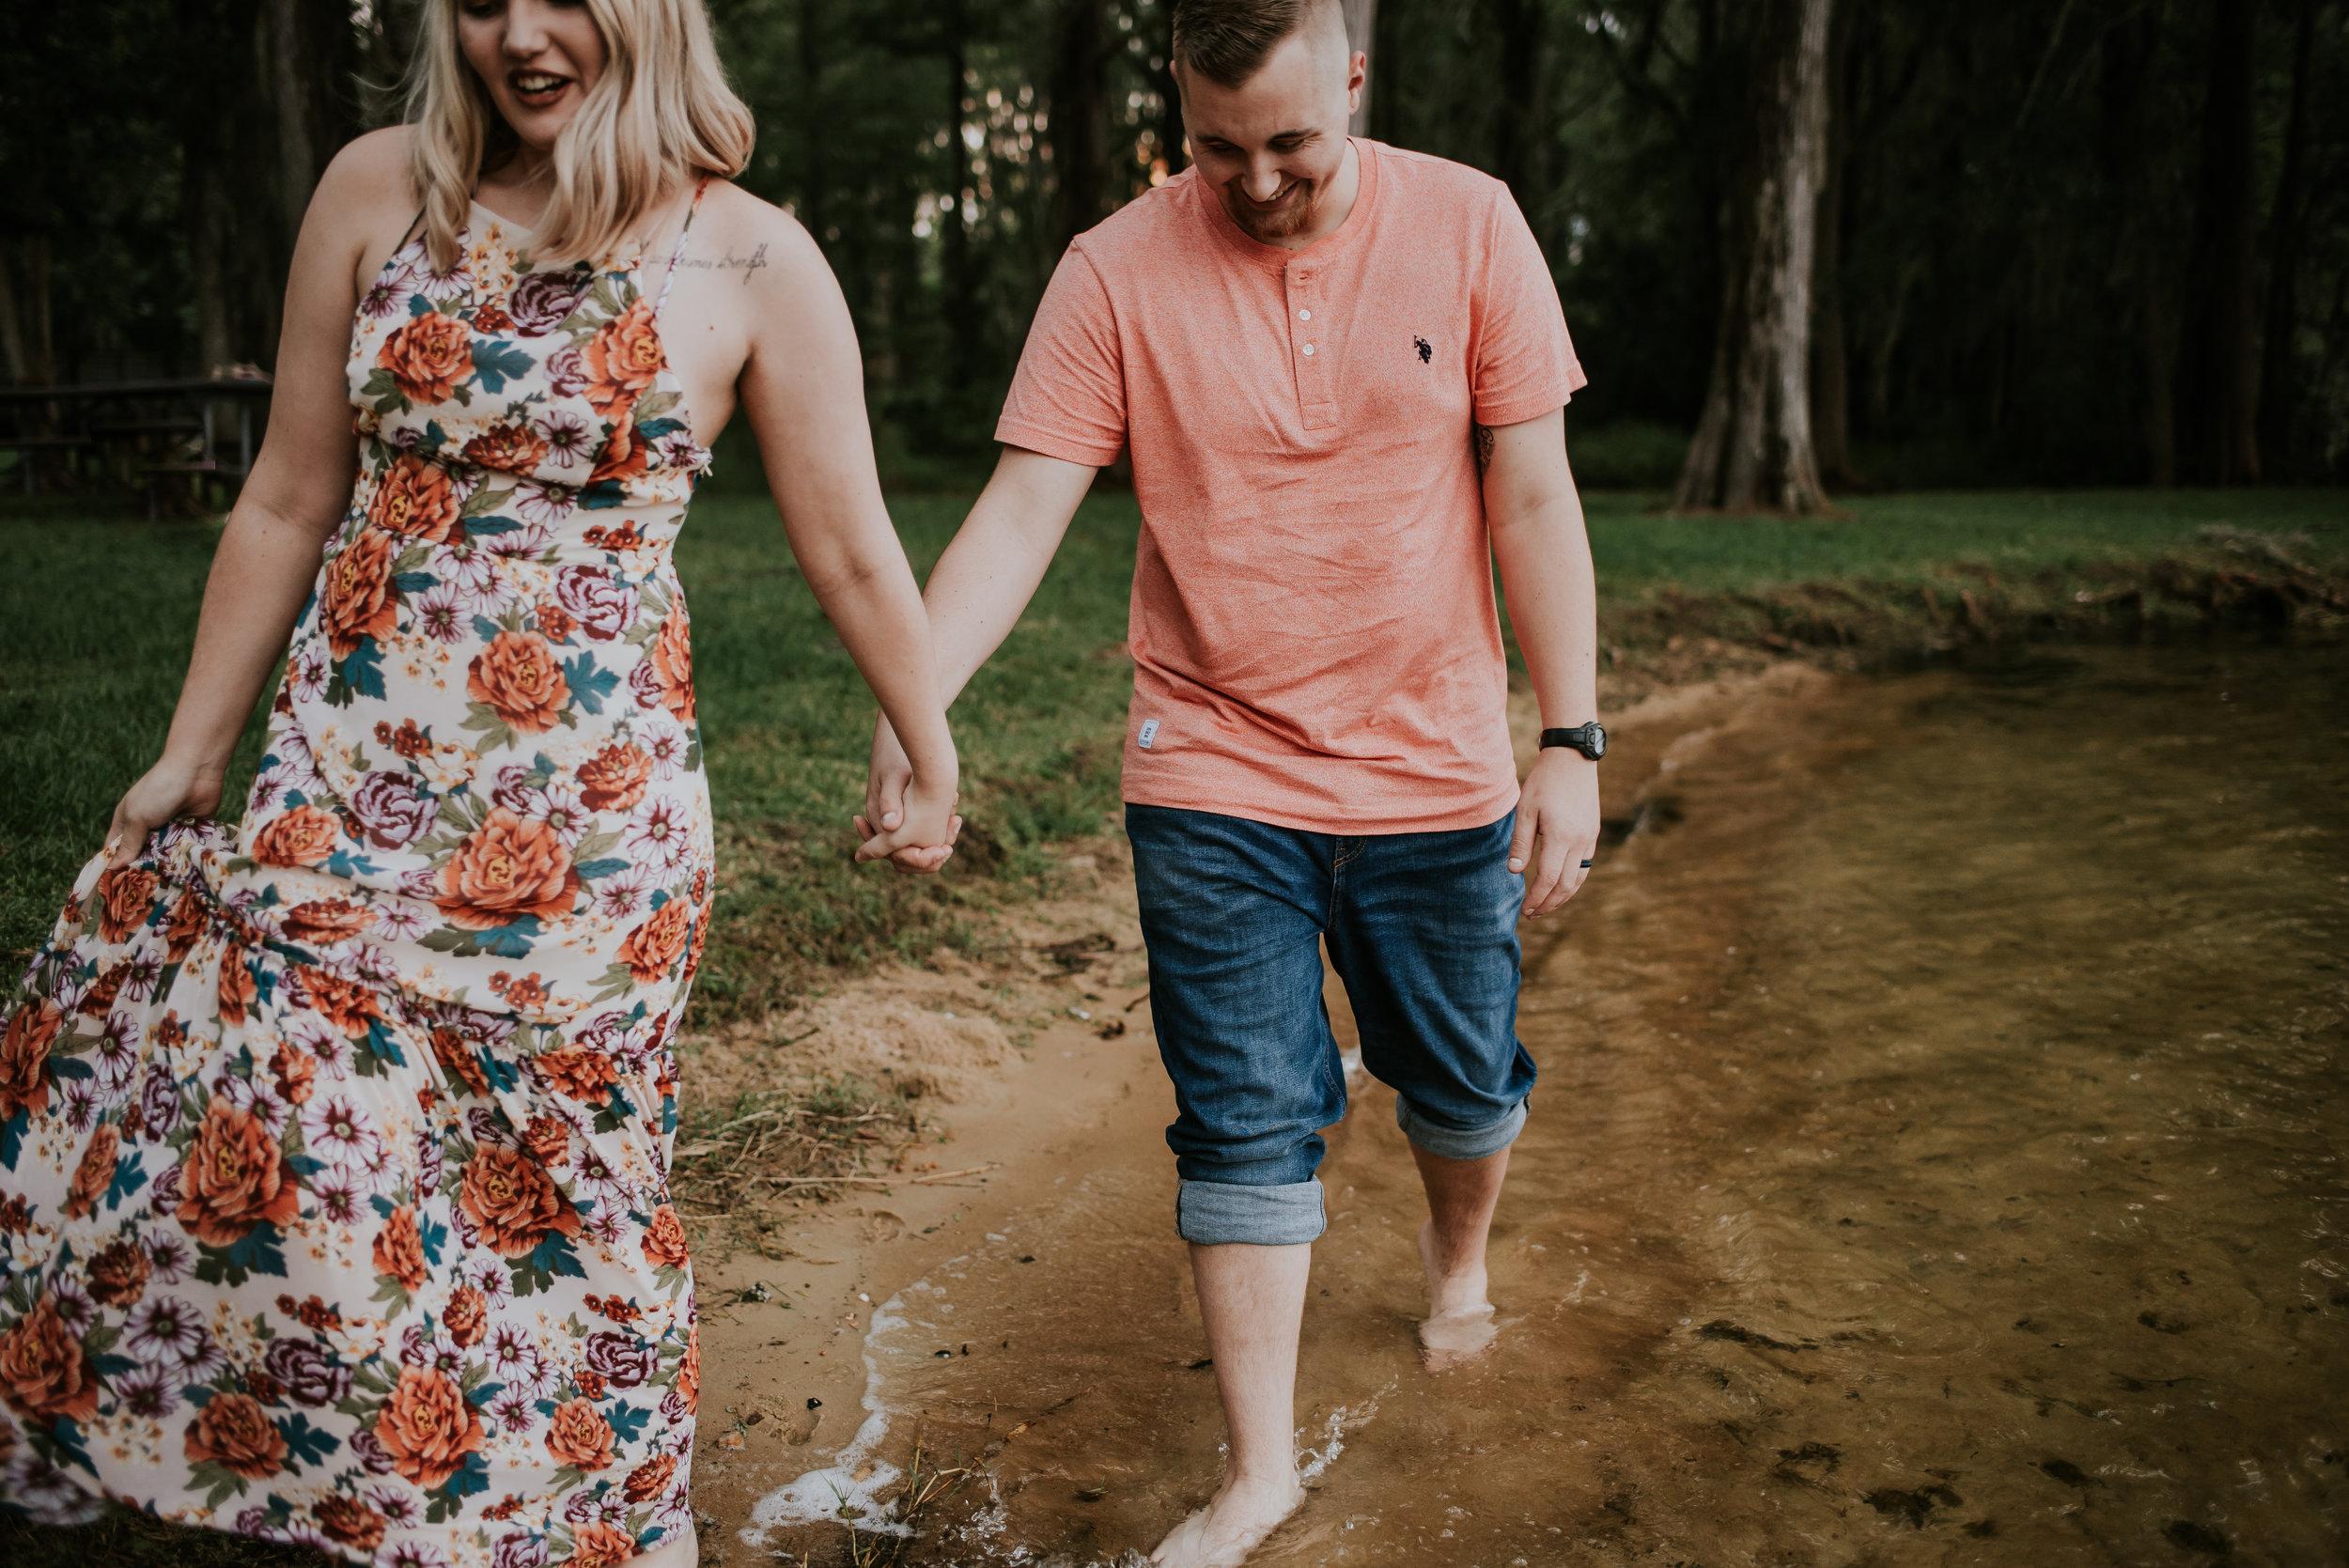 kimberly-trey-crestview-florida-couples-photographer-45.jpg